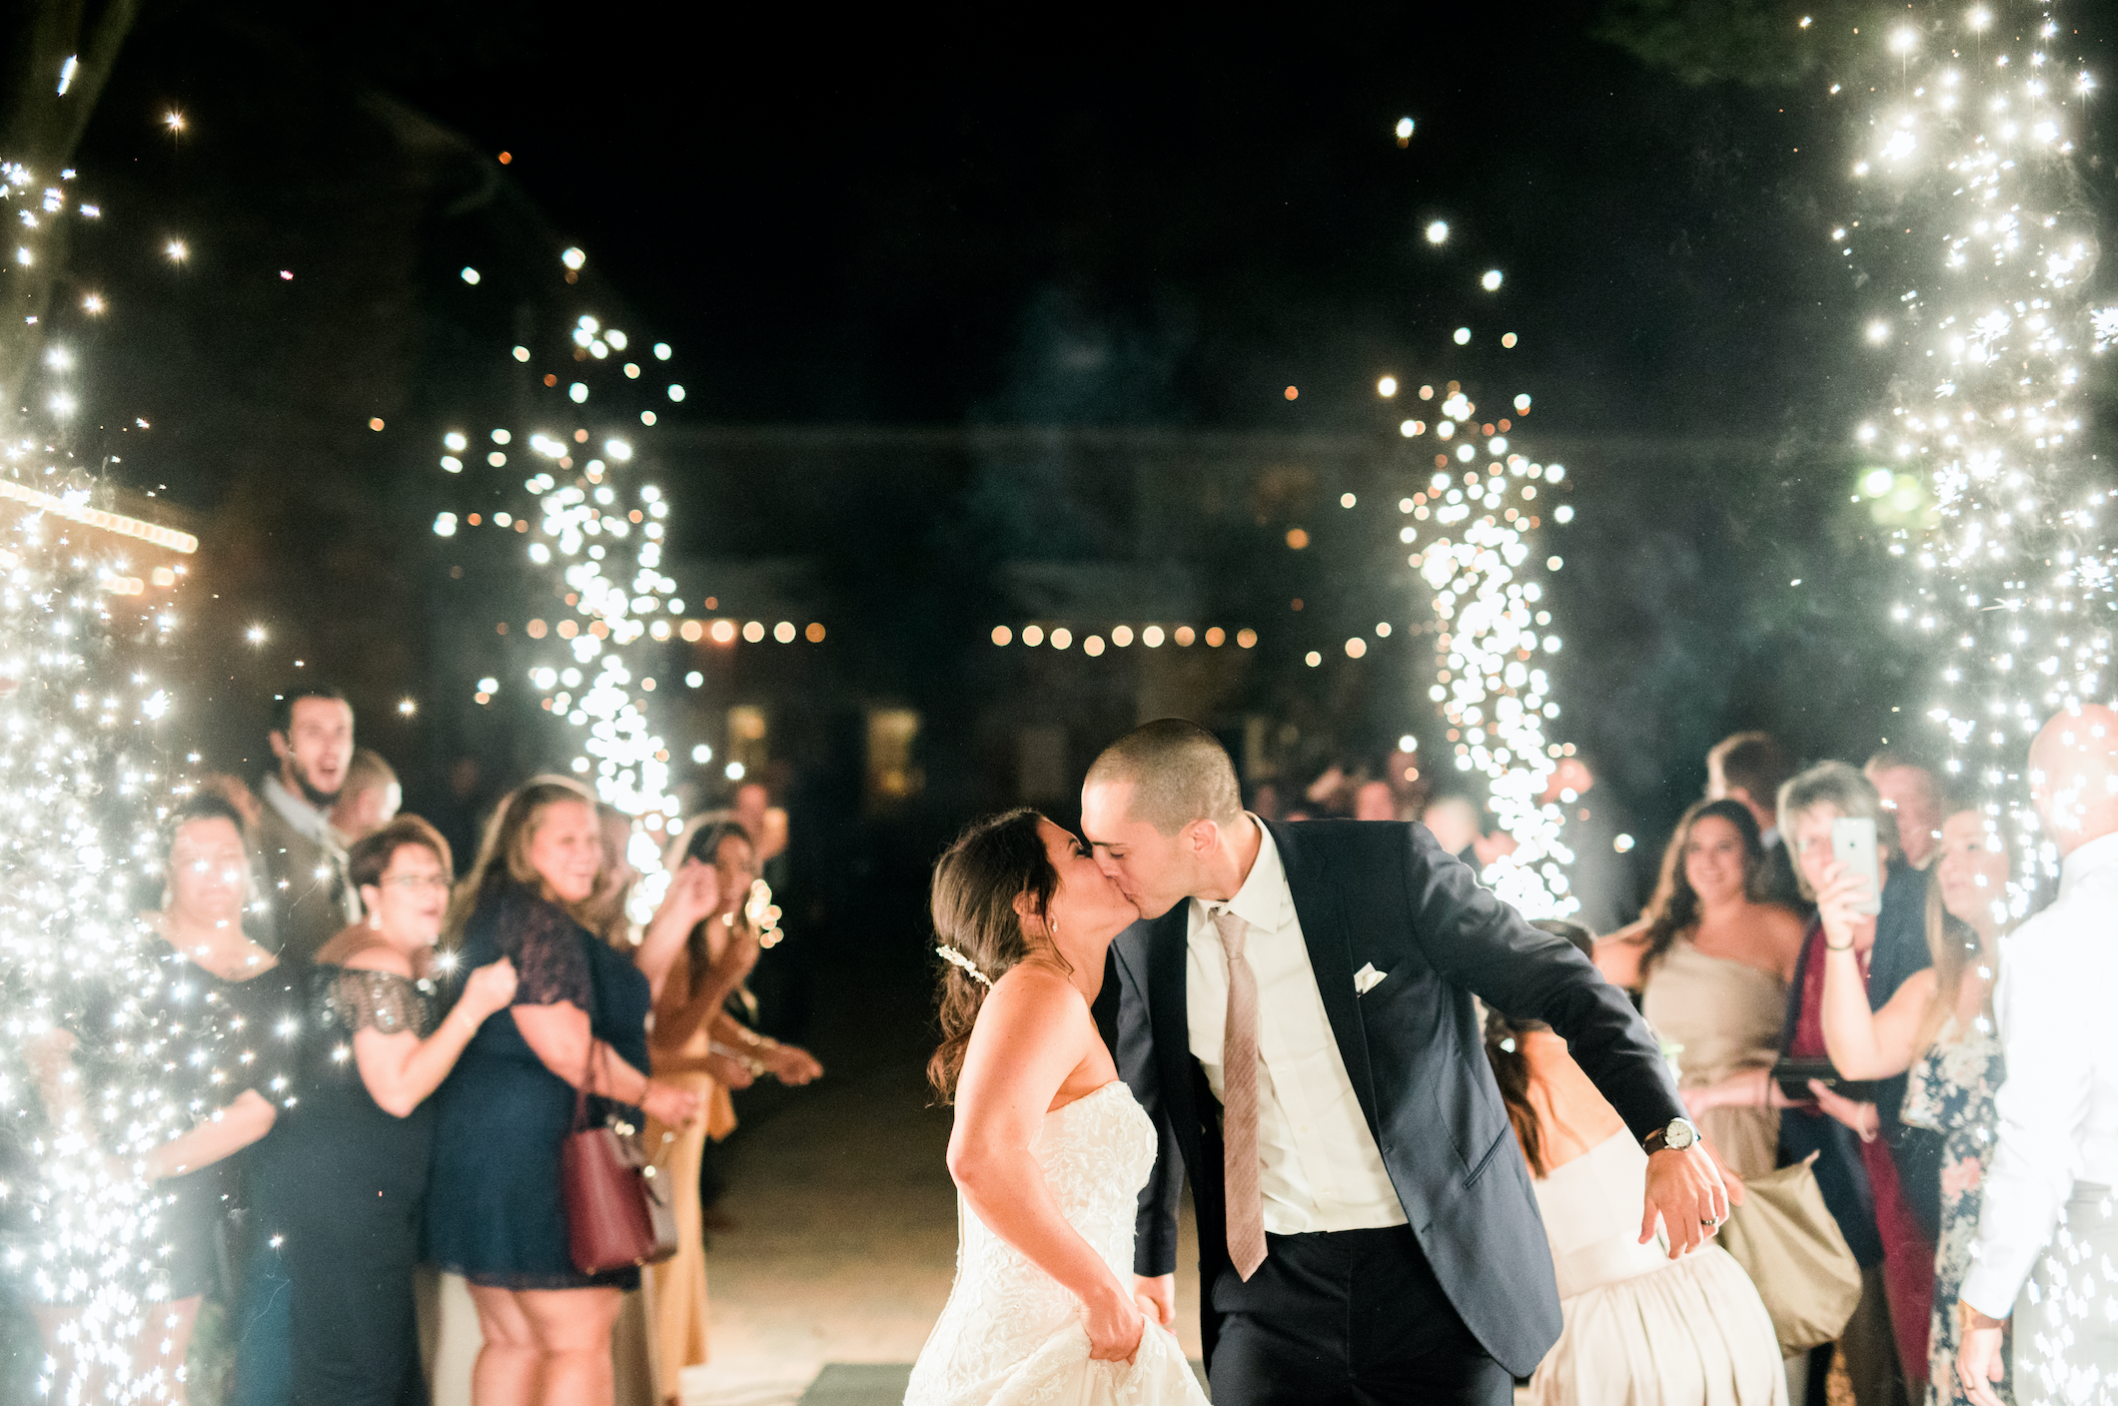 Magic Sparklers - Photo: Matt Stambaugh Media